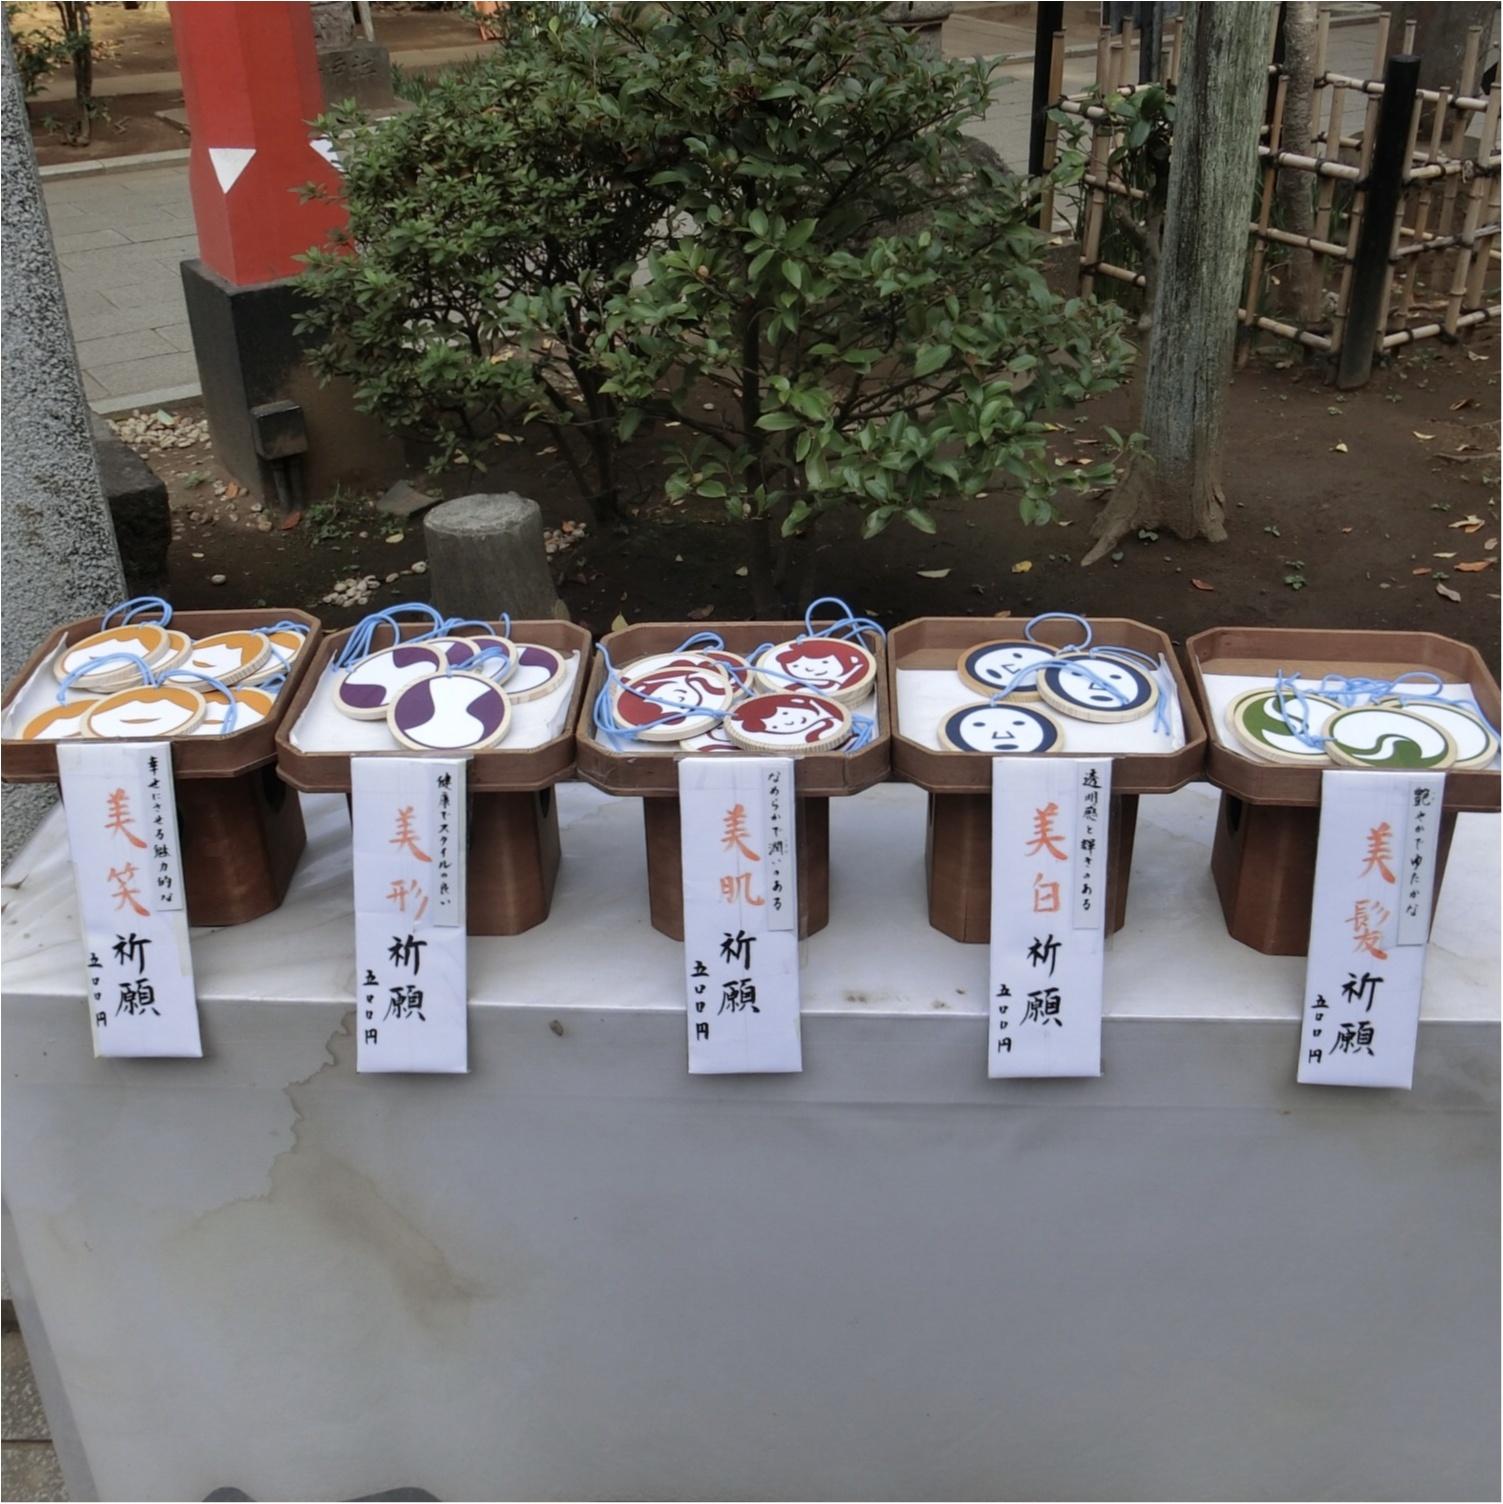 【LON CAFE①】フレンチトースト専門店〜江ノ島まったりデート〜_5